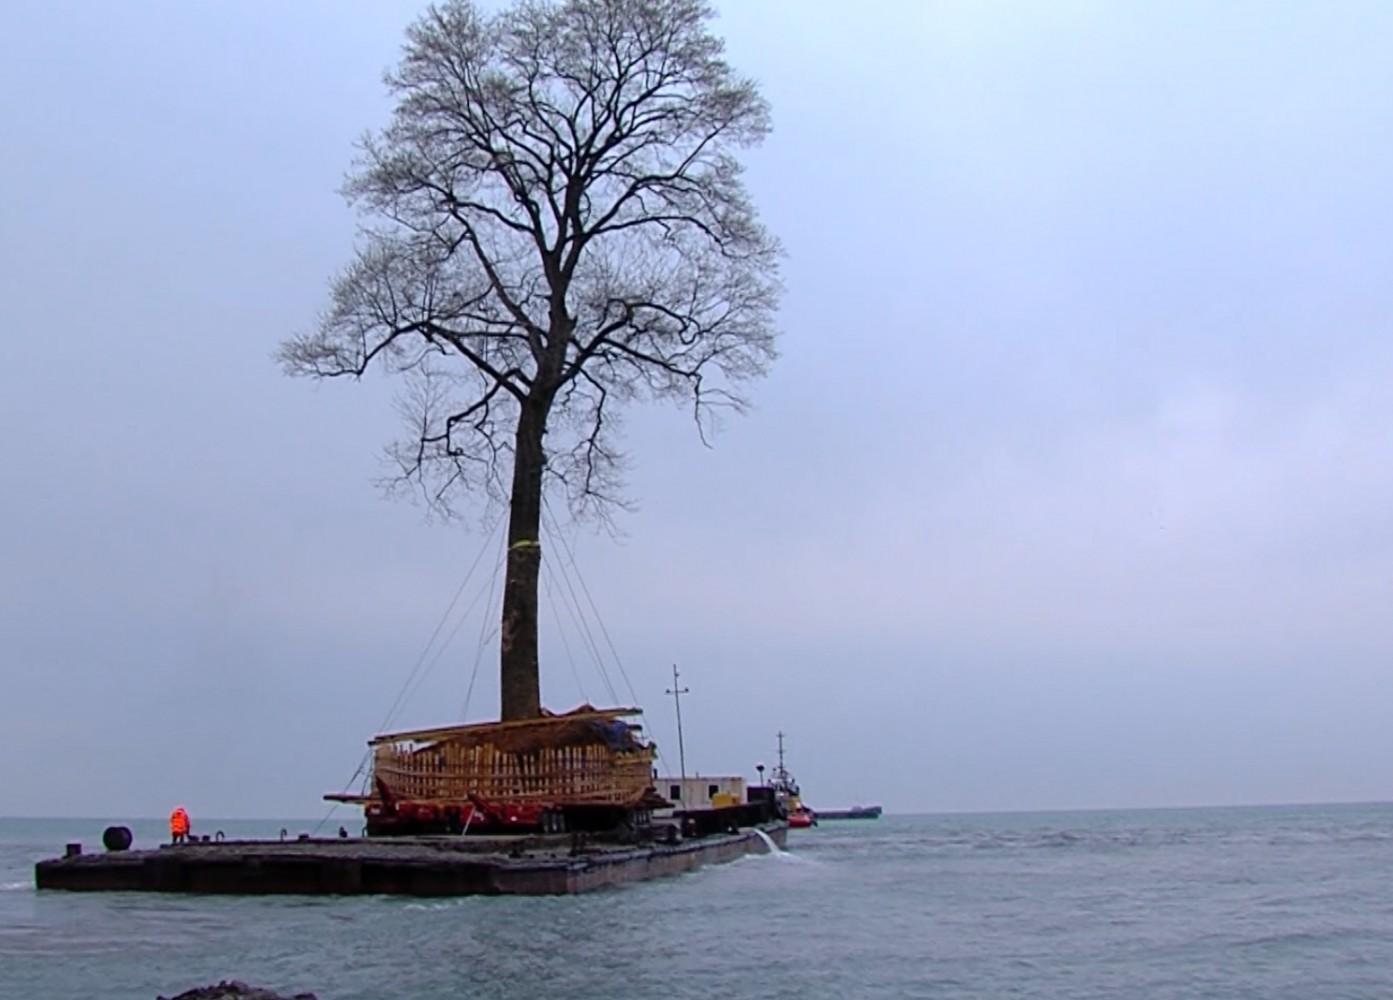 Перевозка тюльпанового дерева. Фото с сайта presa.ge